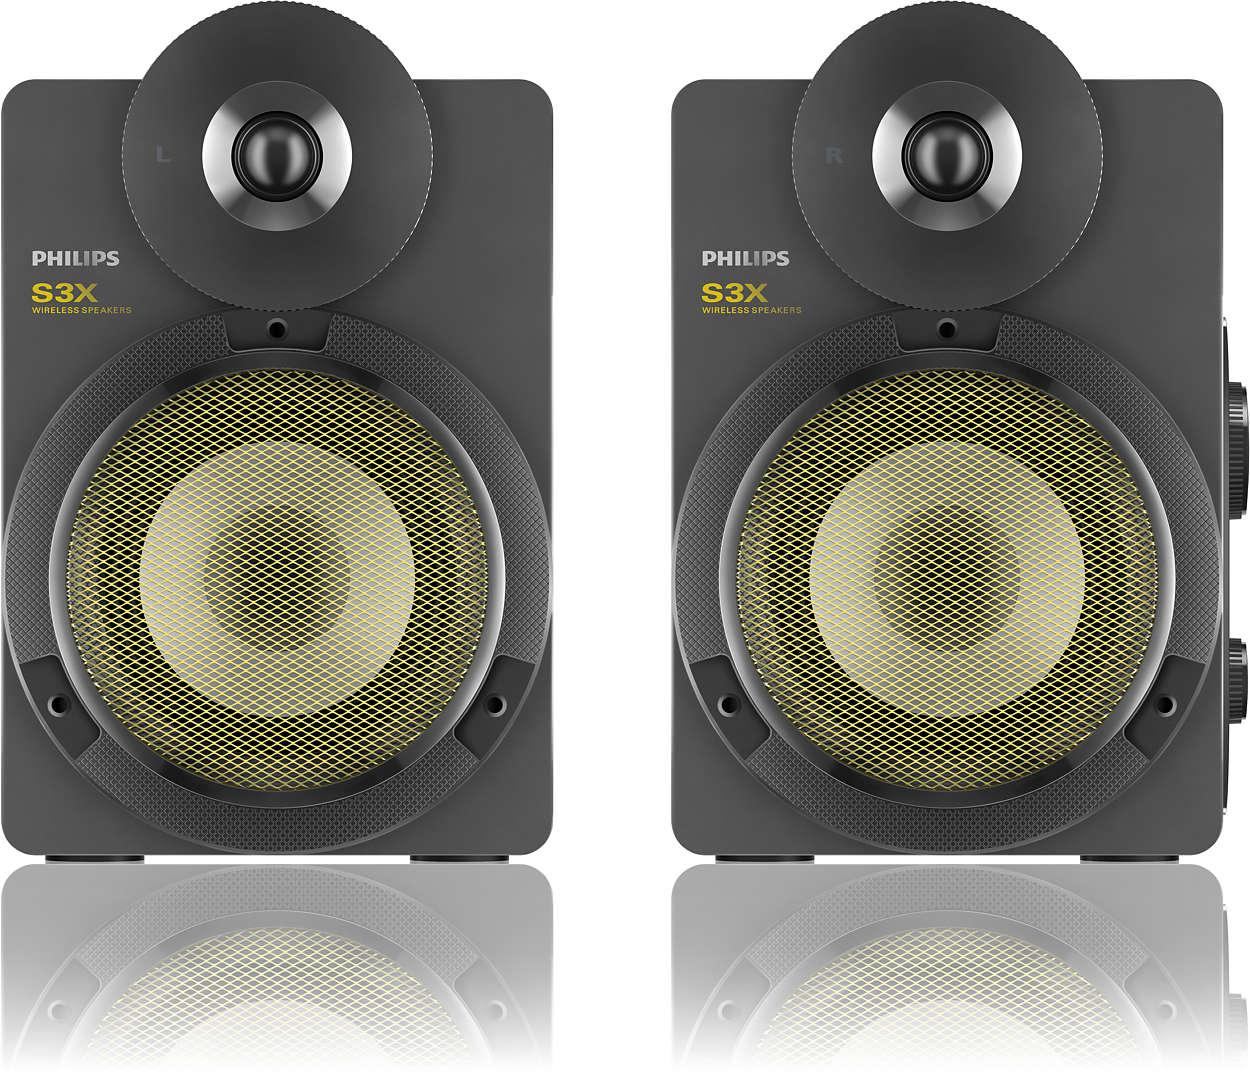 kabellose stereo lautsprecher mit bluetooth bts3000g 10. Black Bedroom Furniture Sets. Home Design Ideas